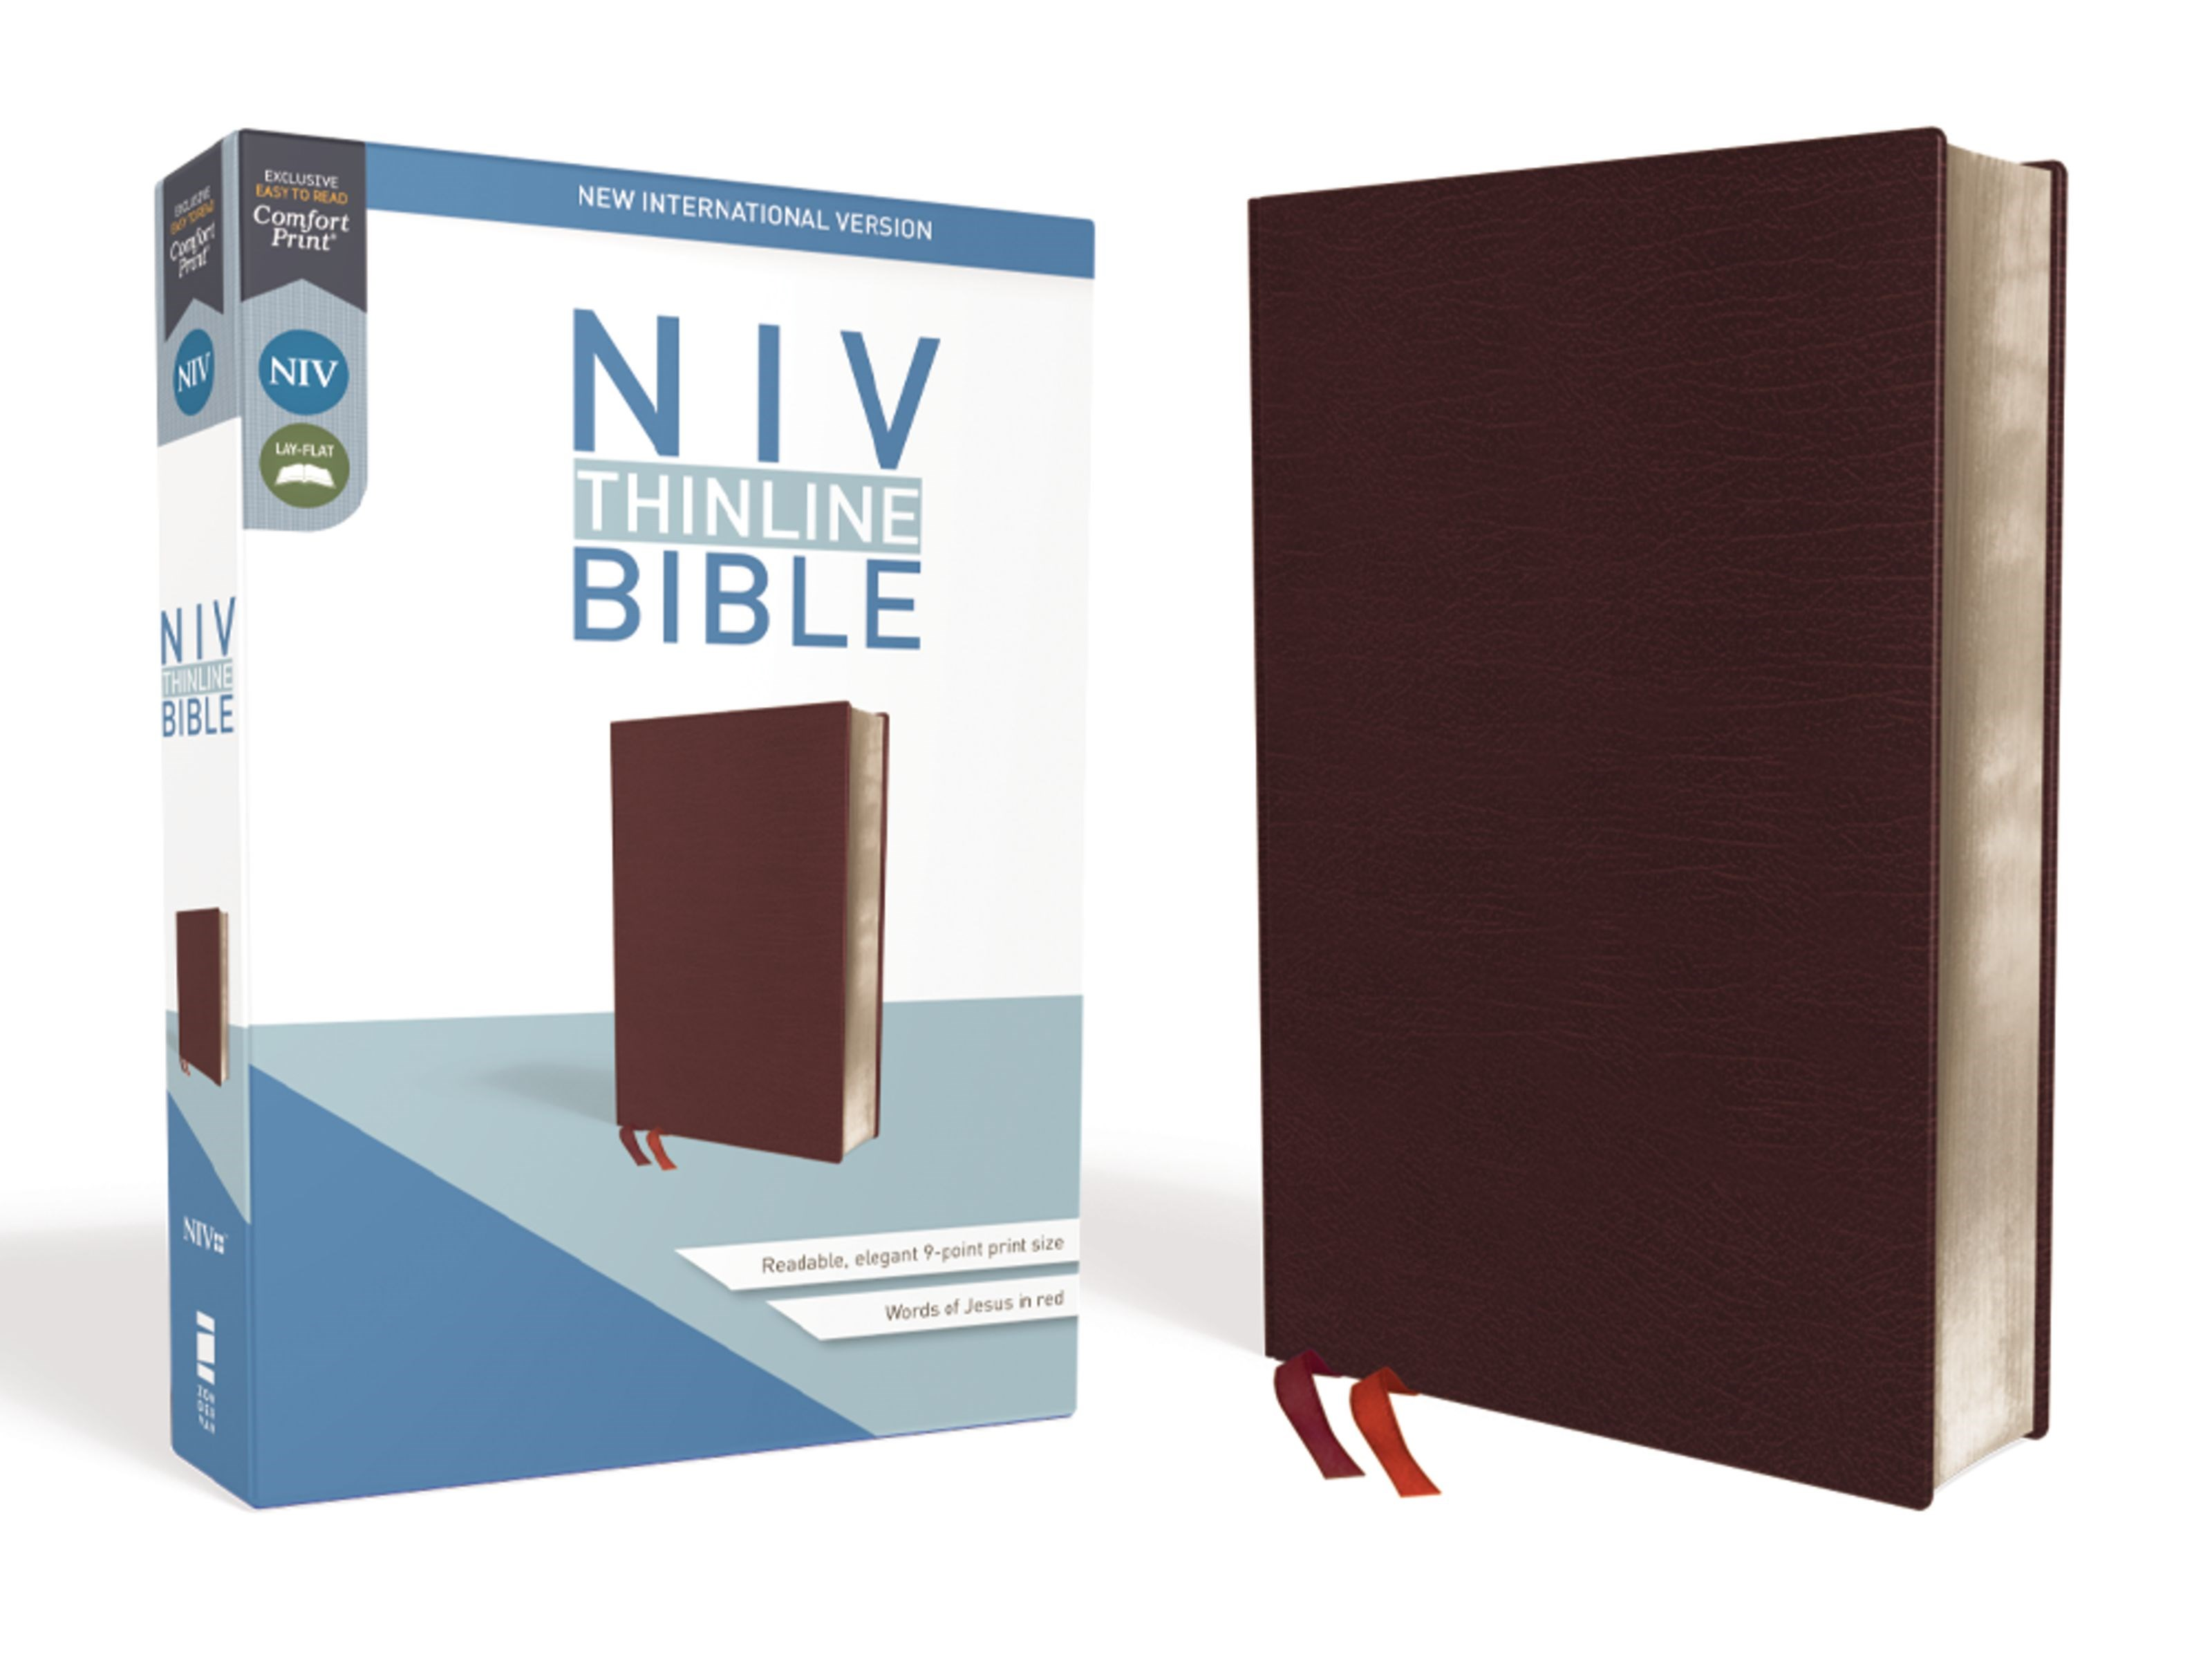 NIV Thinline Bible (Comfort Print)-Burgundy Bonded Leather